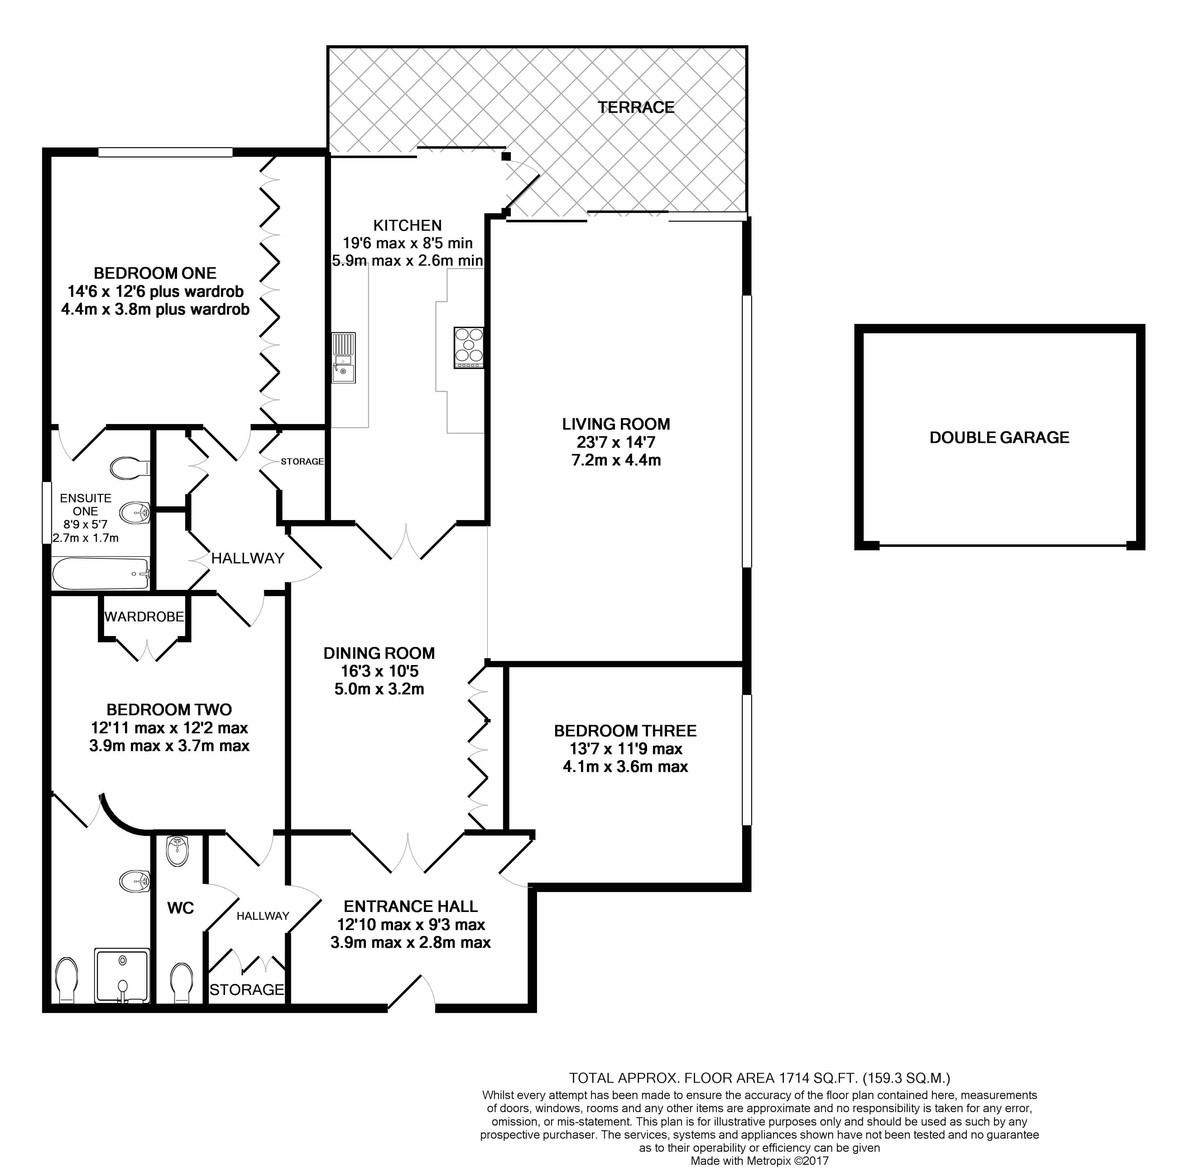 Petersham Place, Richmond Hill Road, Edgbaston, West Midlands floorplan 1 of 1